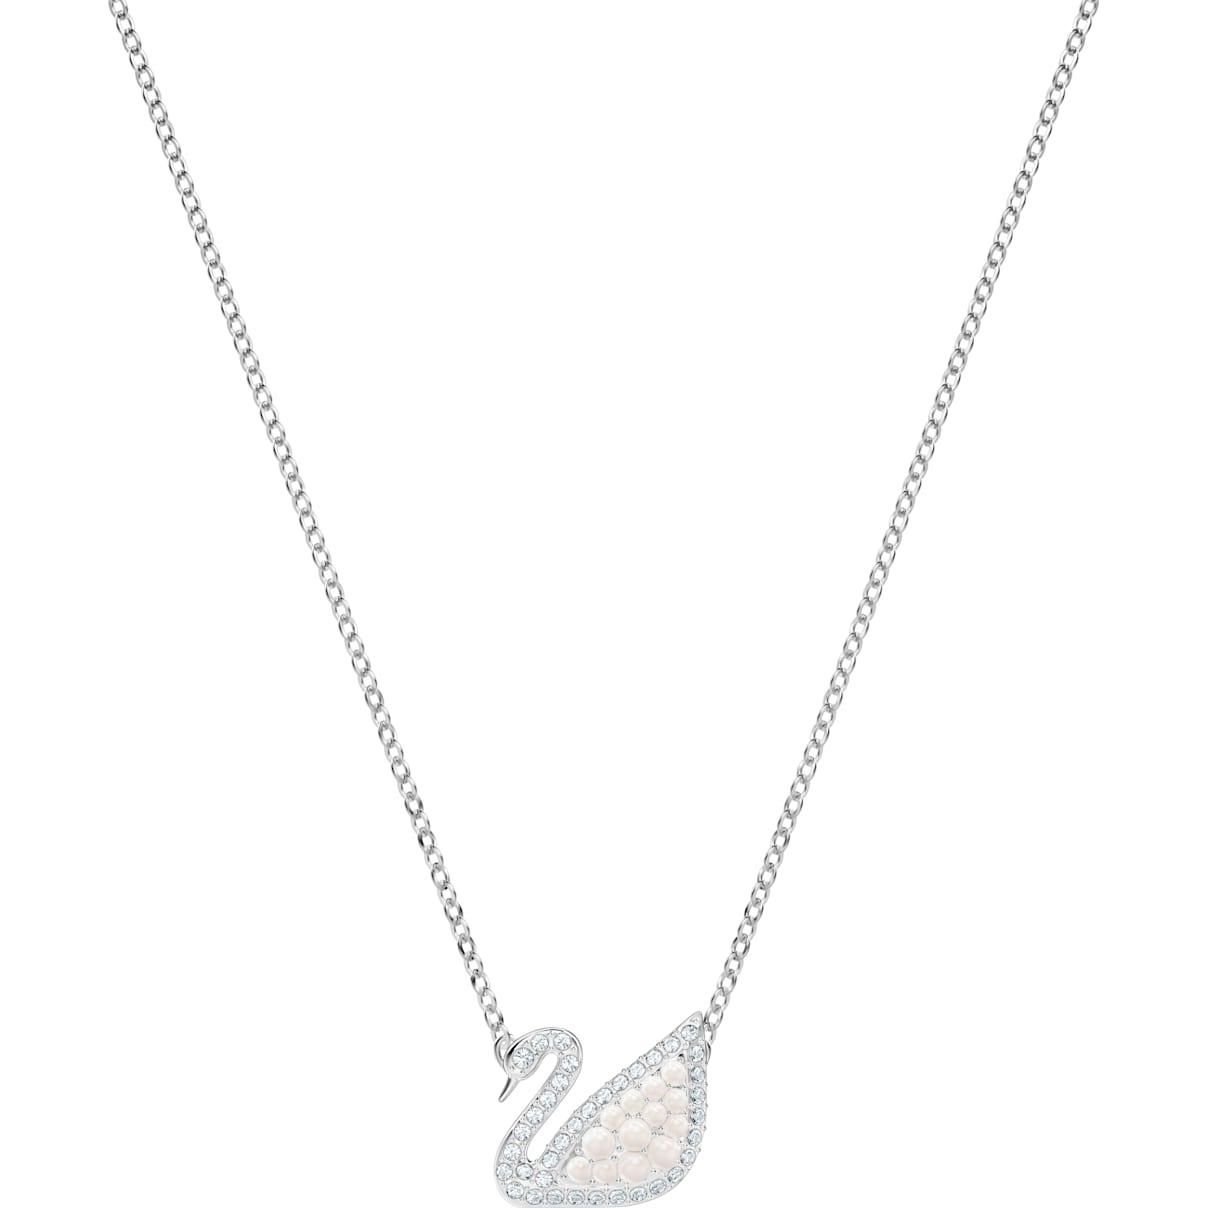 Swarovski Swarovski Iconic Swan Necklace, White, Rhodium plated